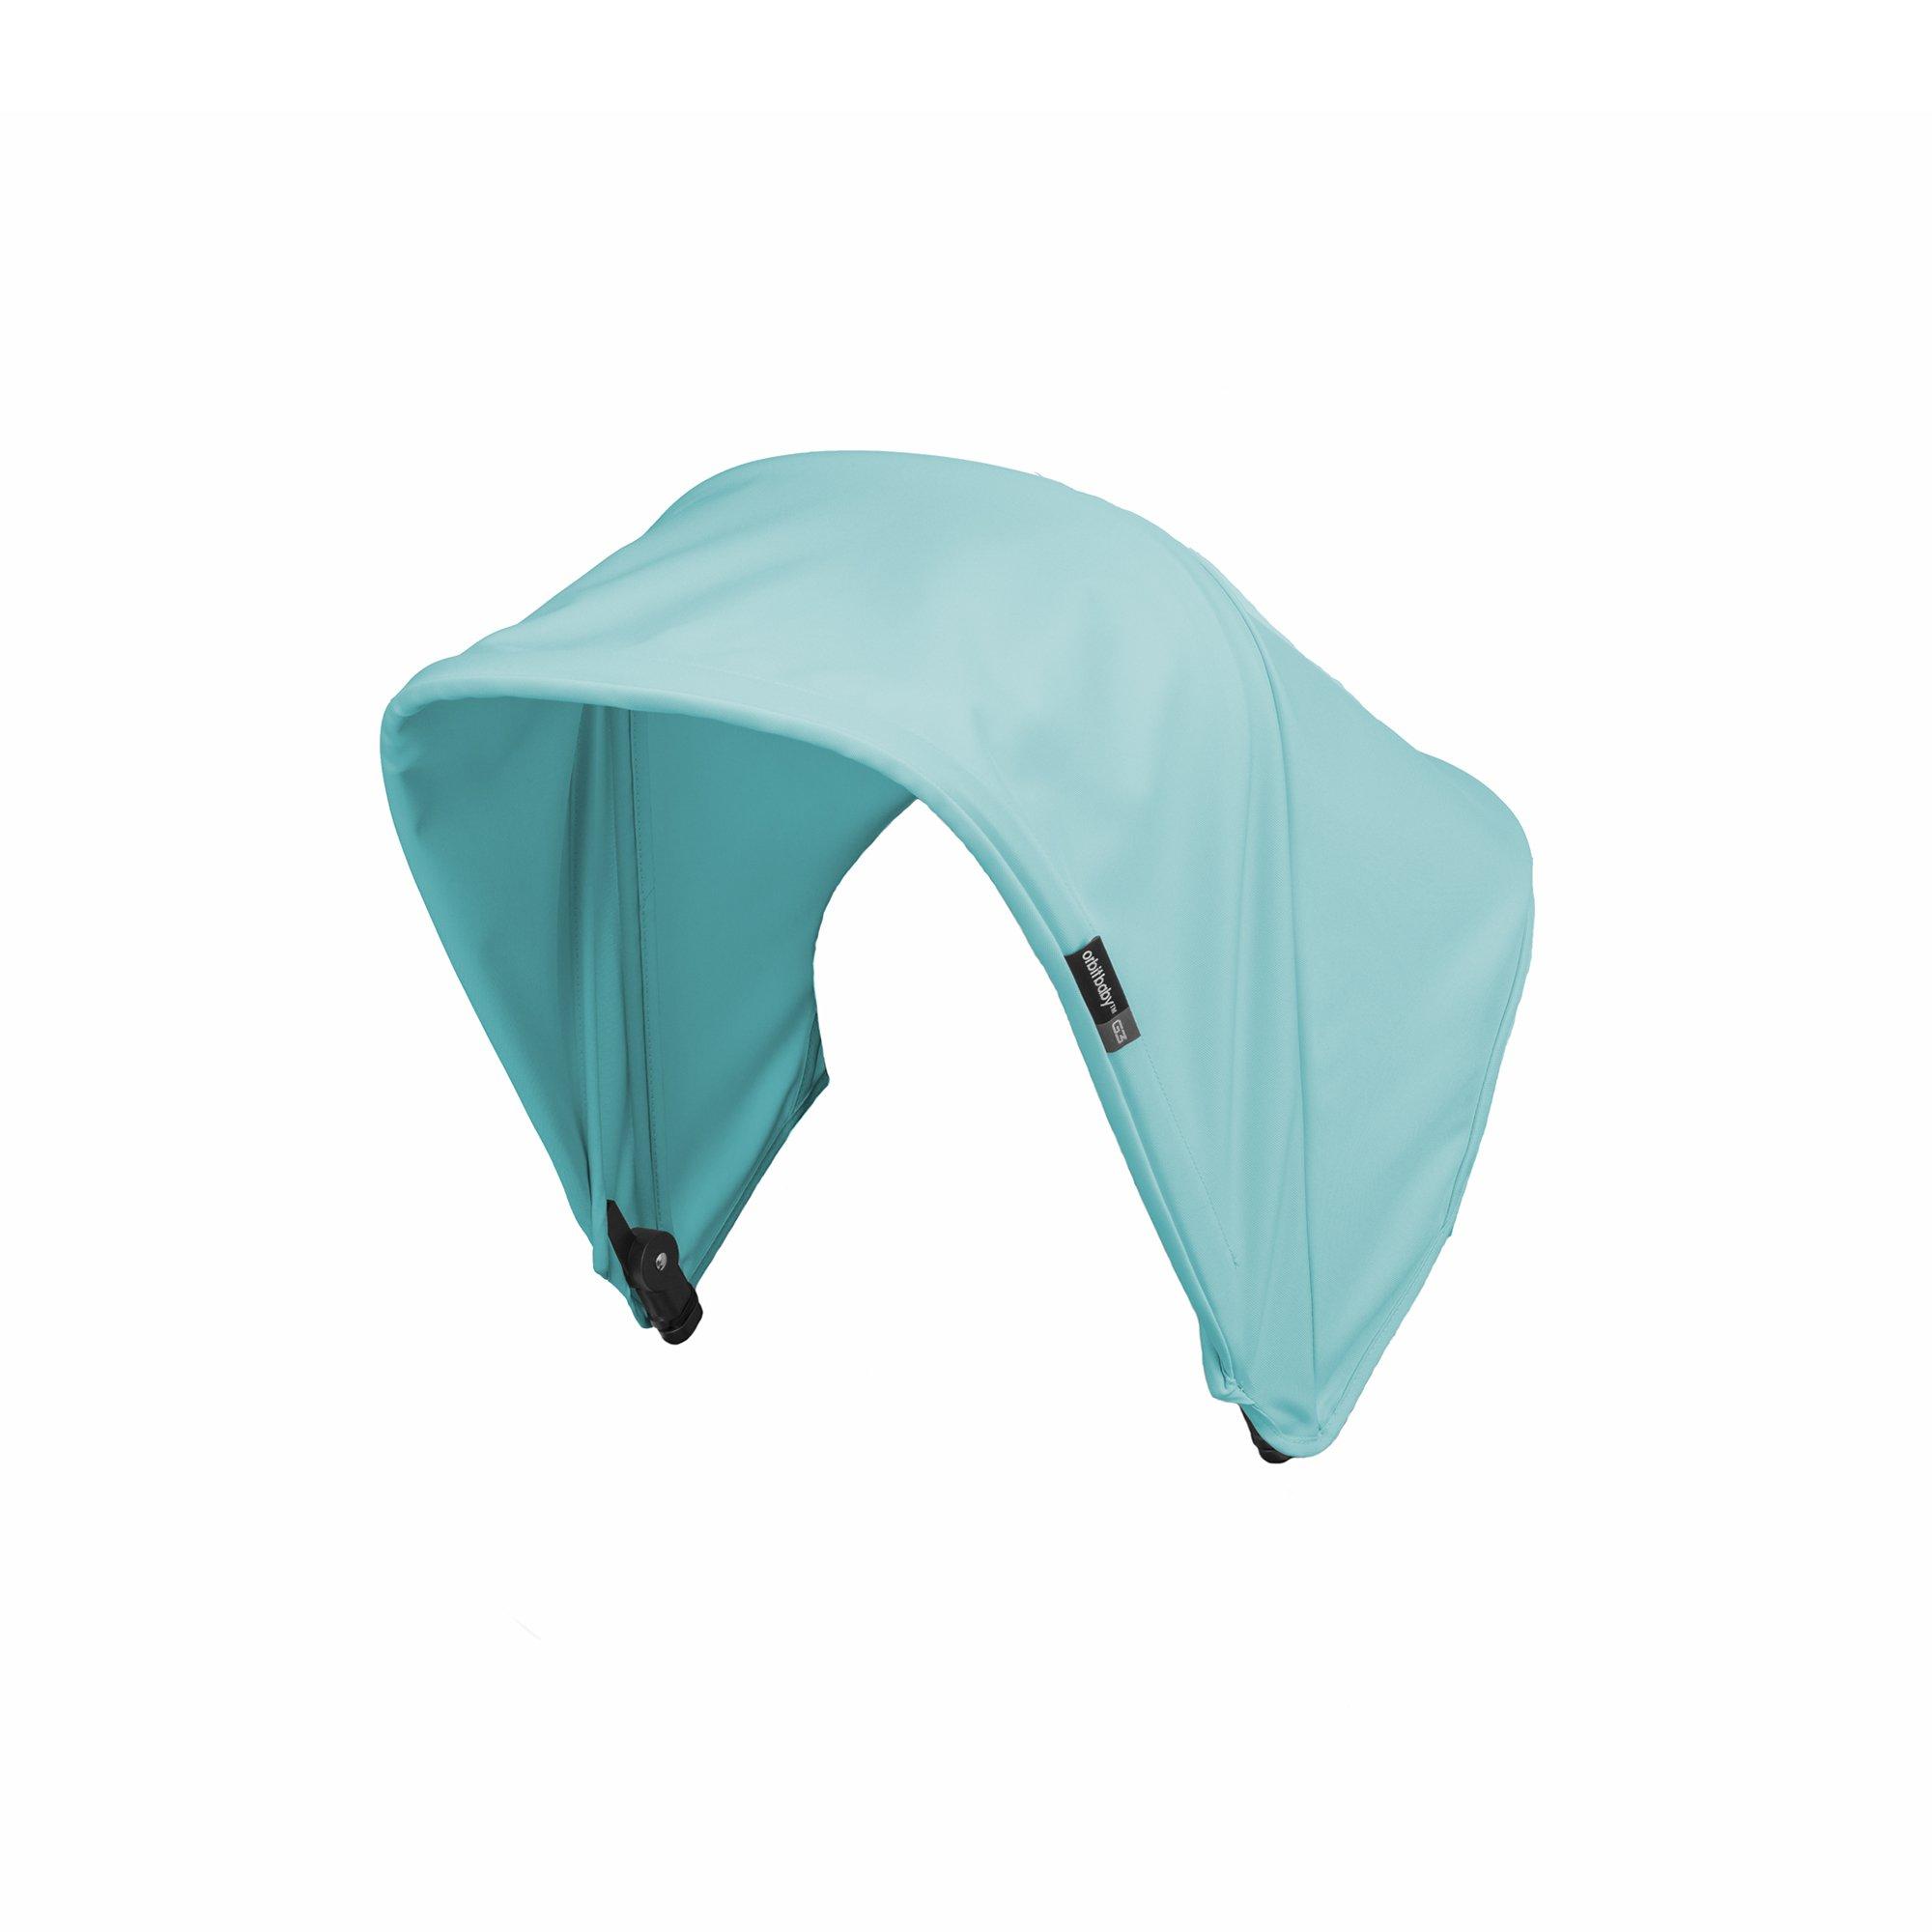 Orbit Baby G3 Stroller Sunshade, Teal product image